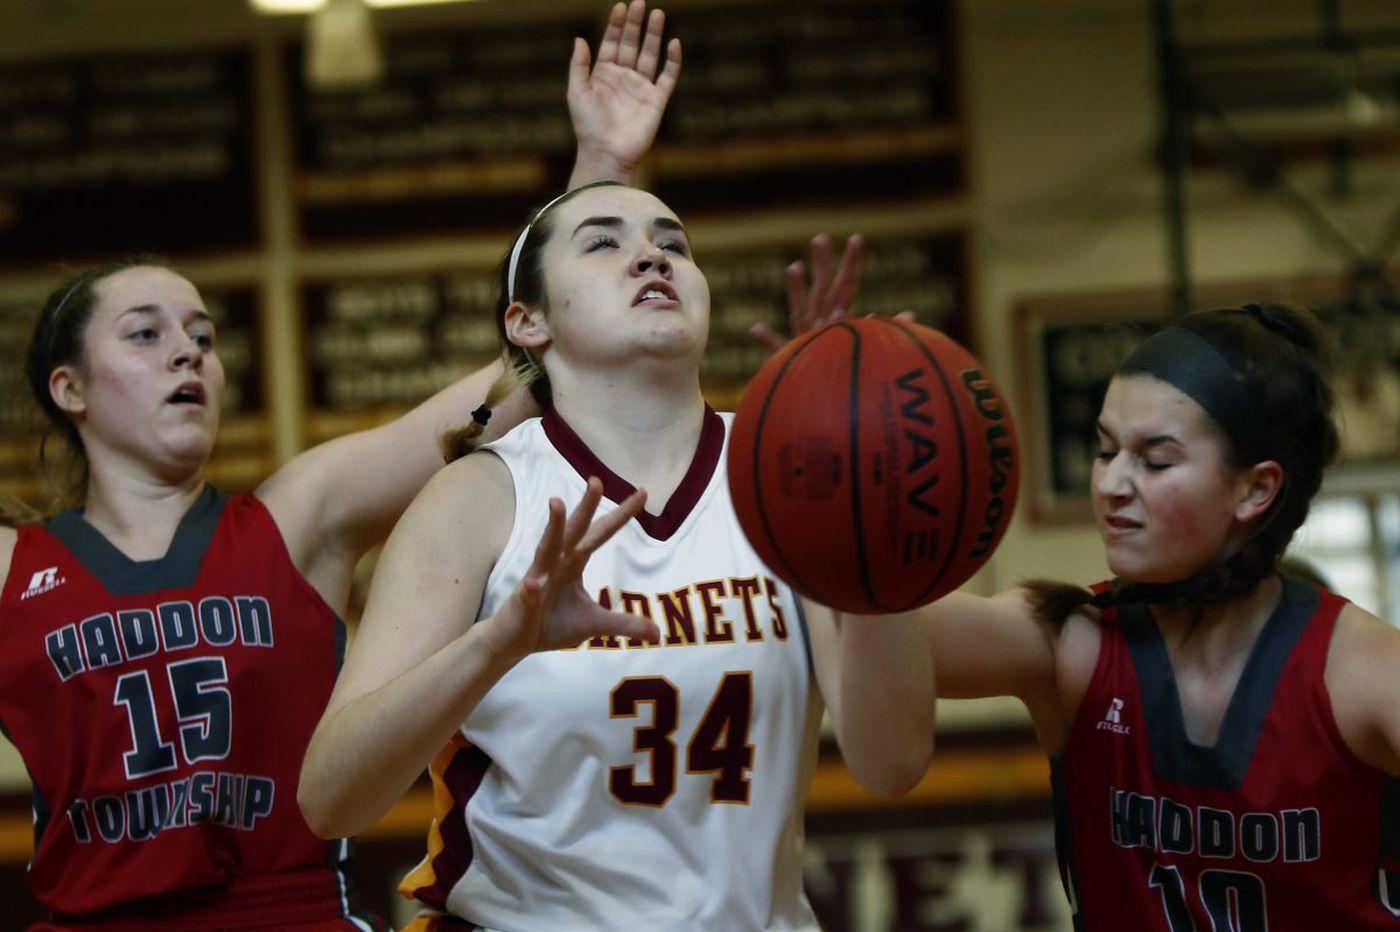 Friday's S.J. roundup: Haddon Heights girls' basketball tops Salem in OT